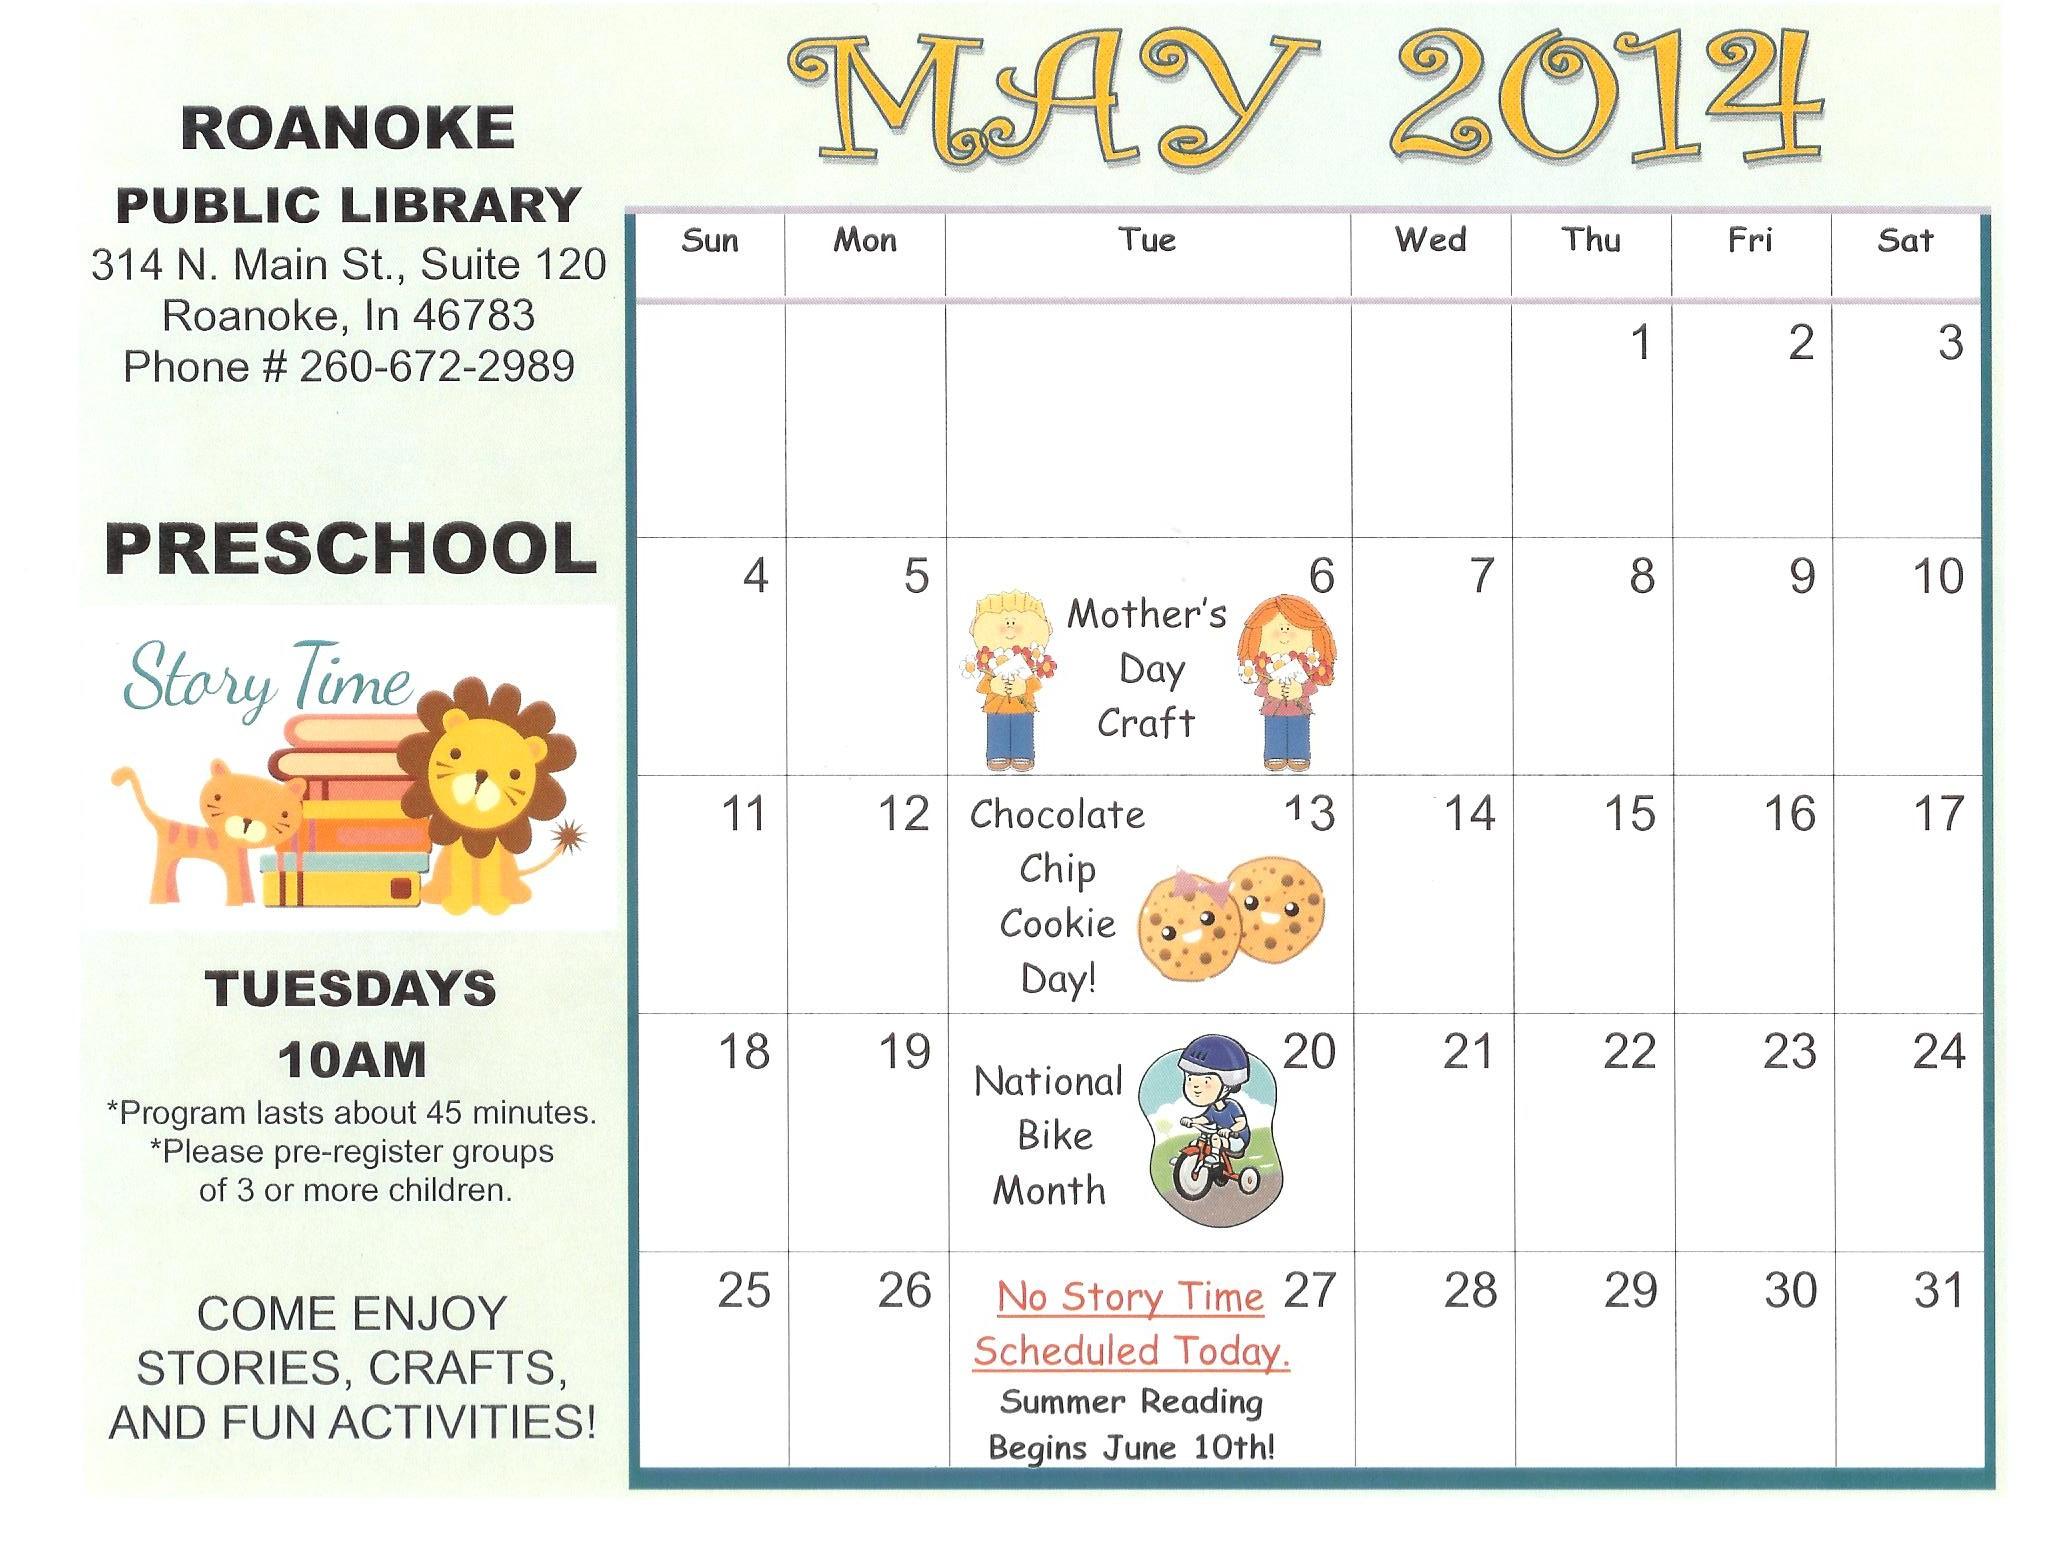 Preschool Story Time Calendar